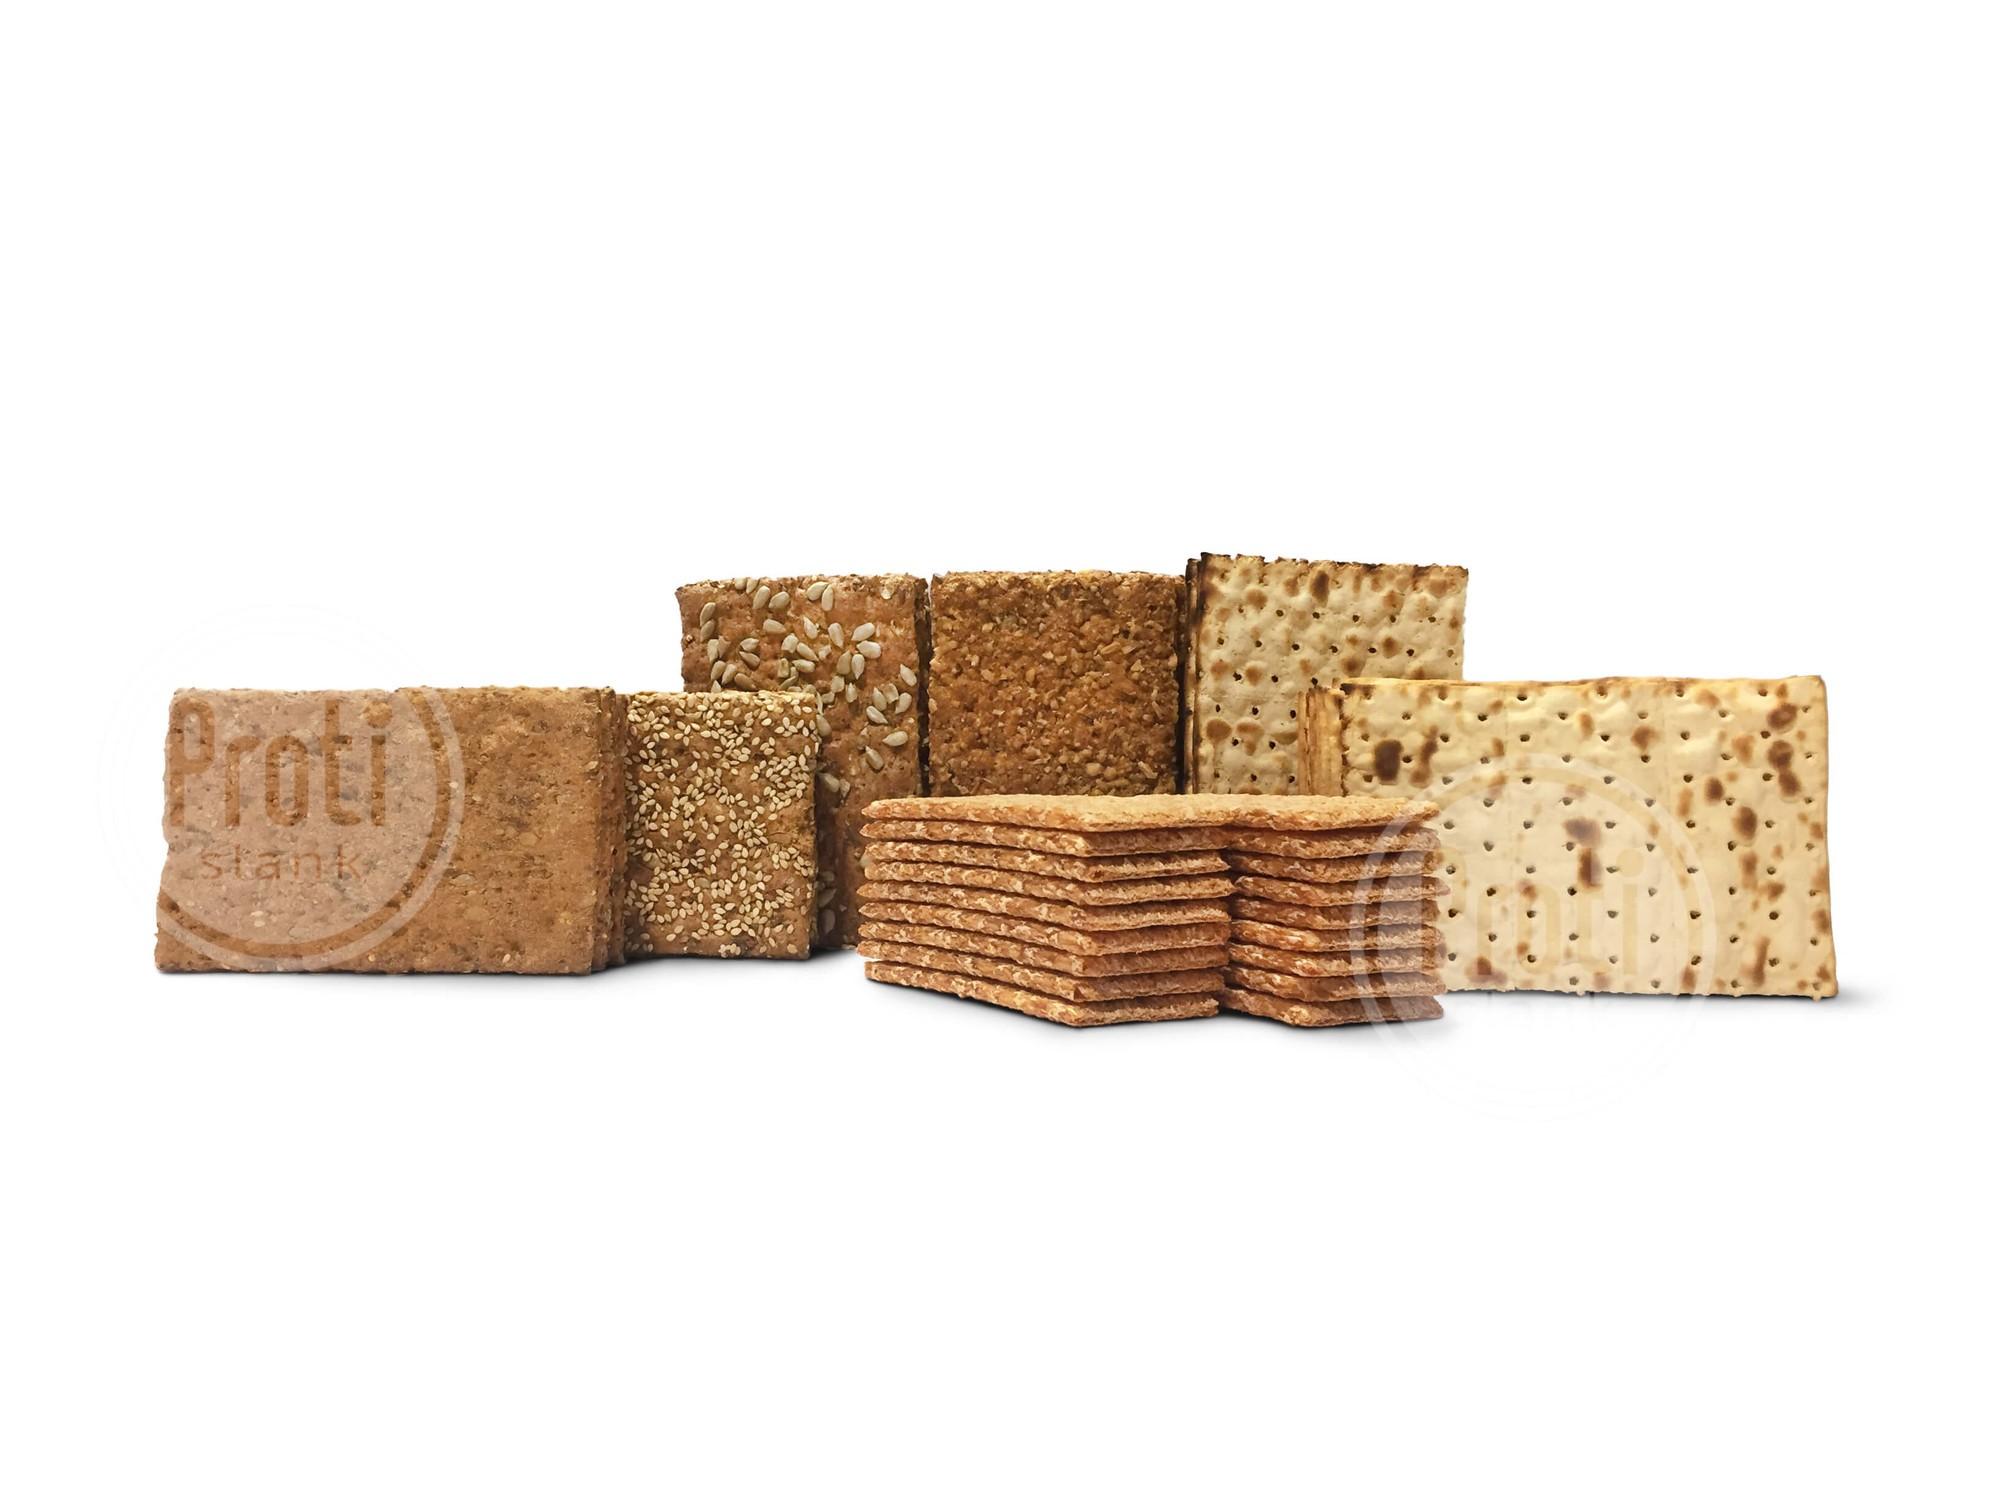 Crackerpakket